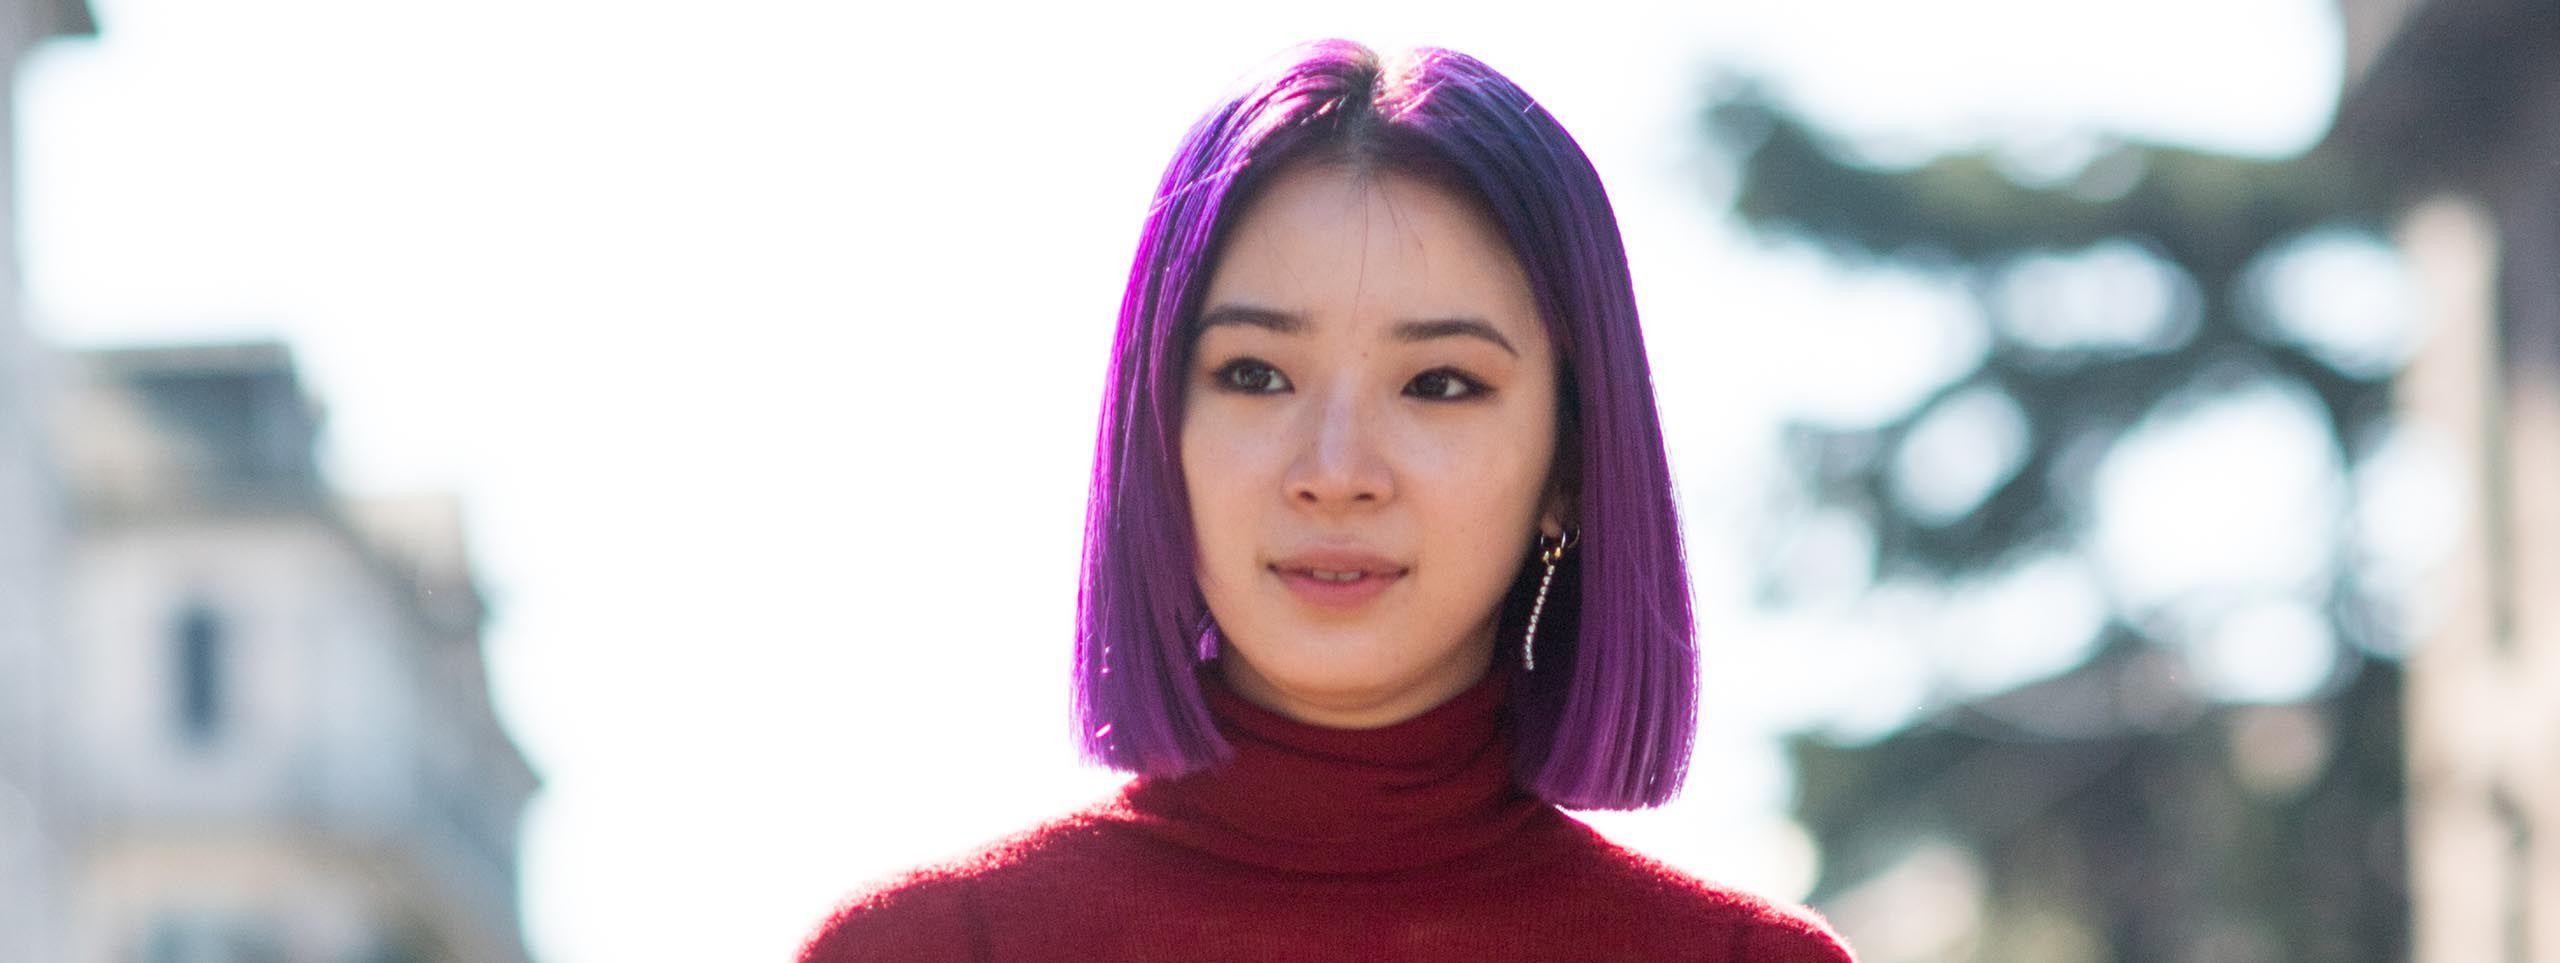 Žena sa ljubičastom bojom kose